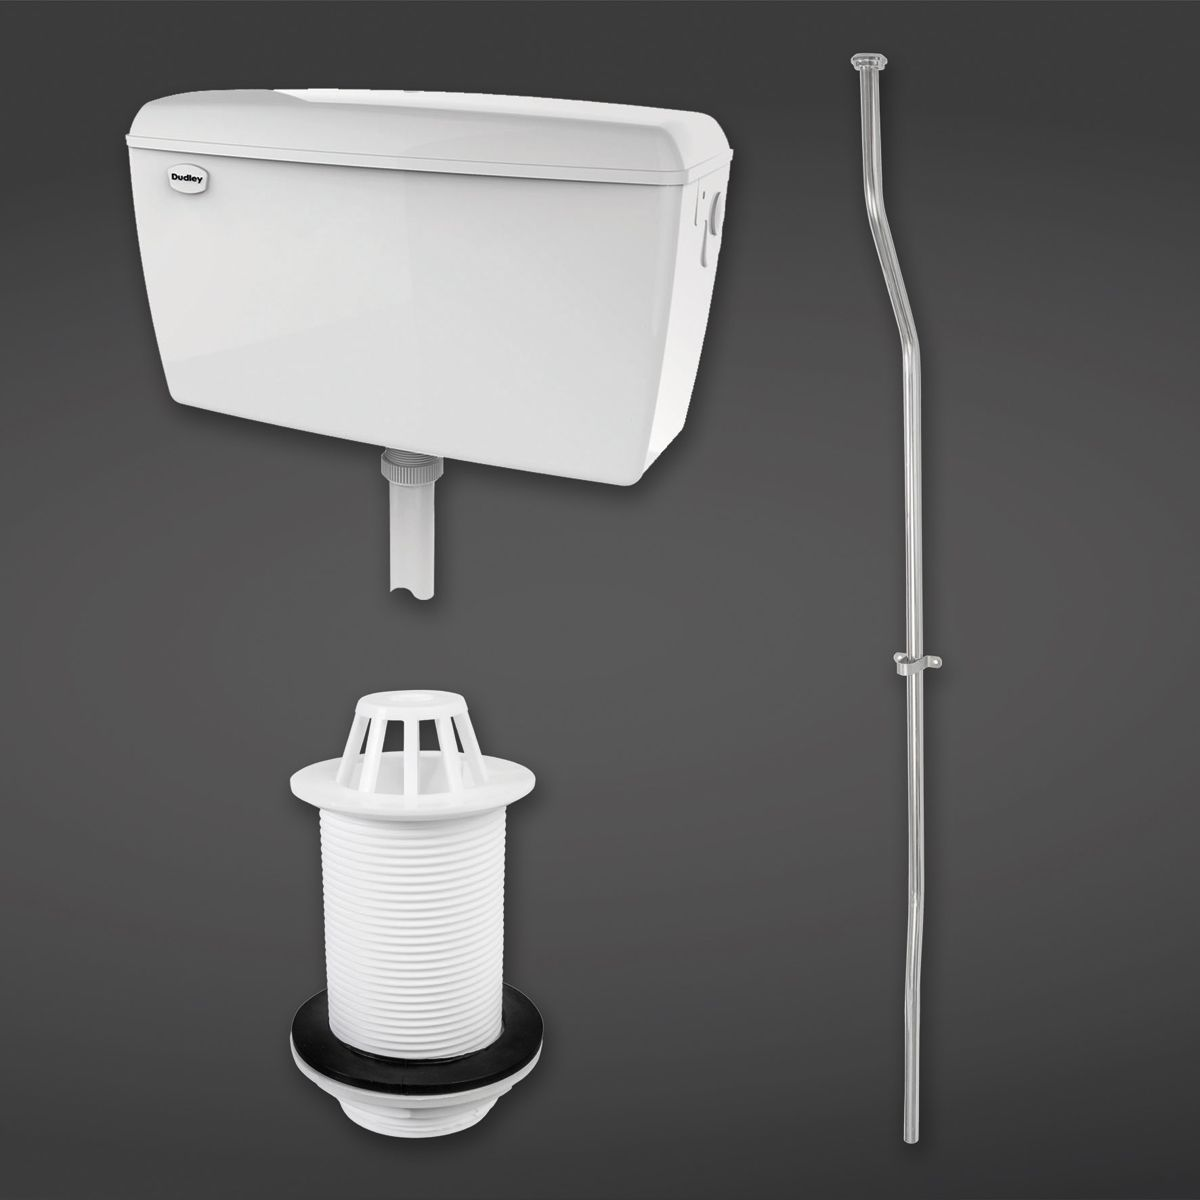 RAK Exposed Automatic Urinal Cistern 4.5L